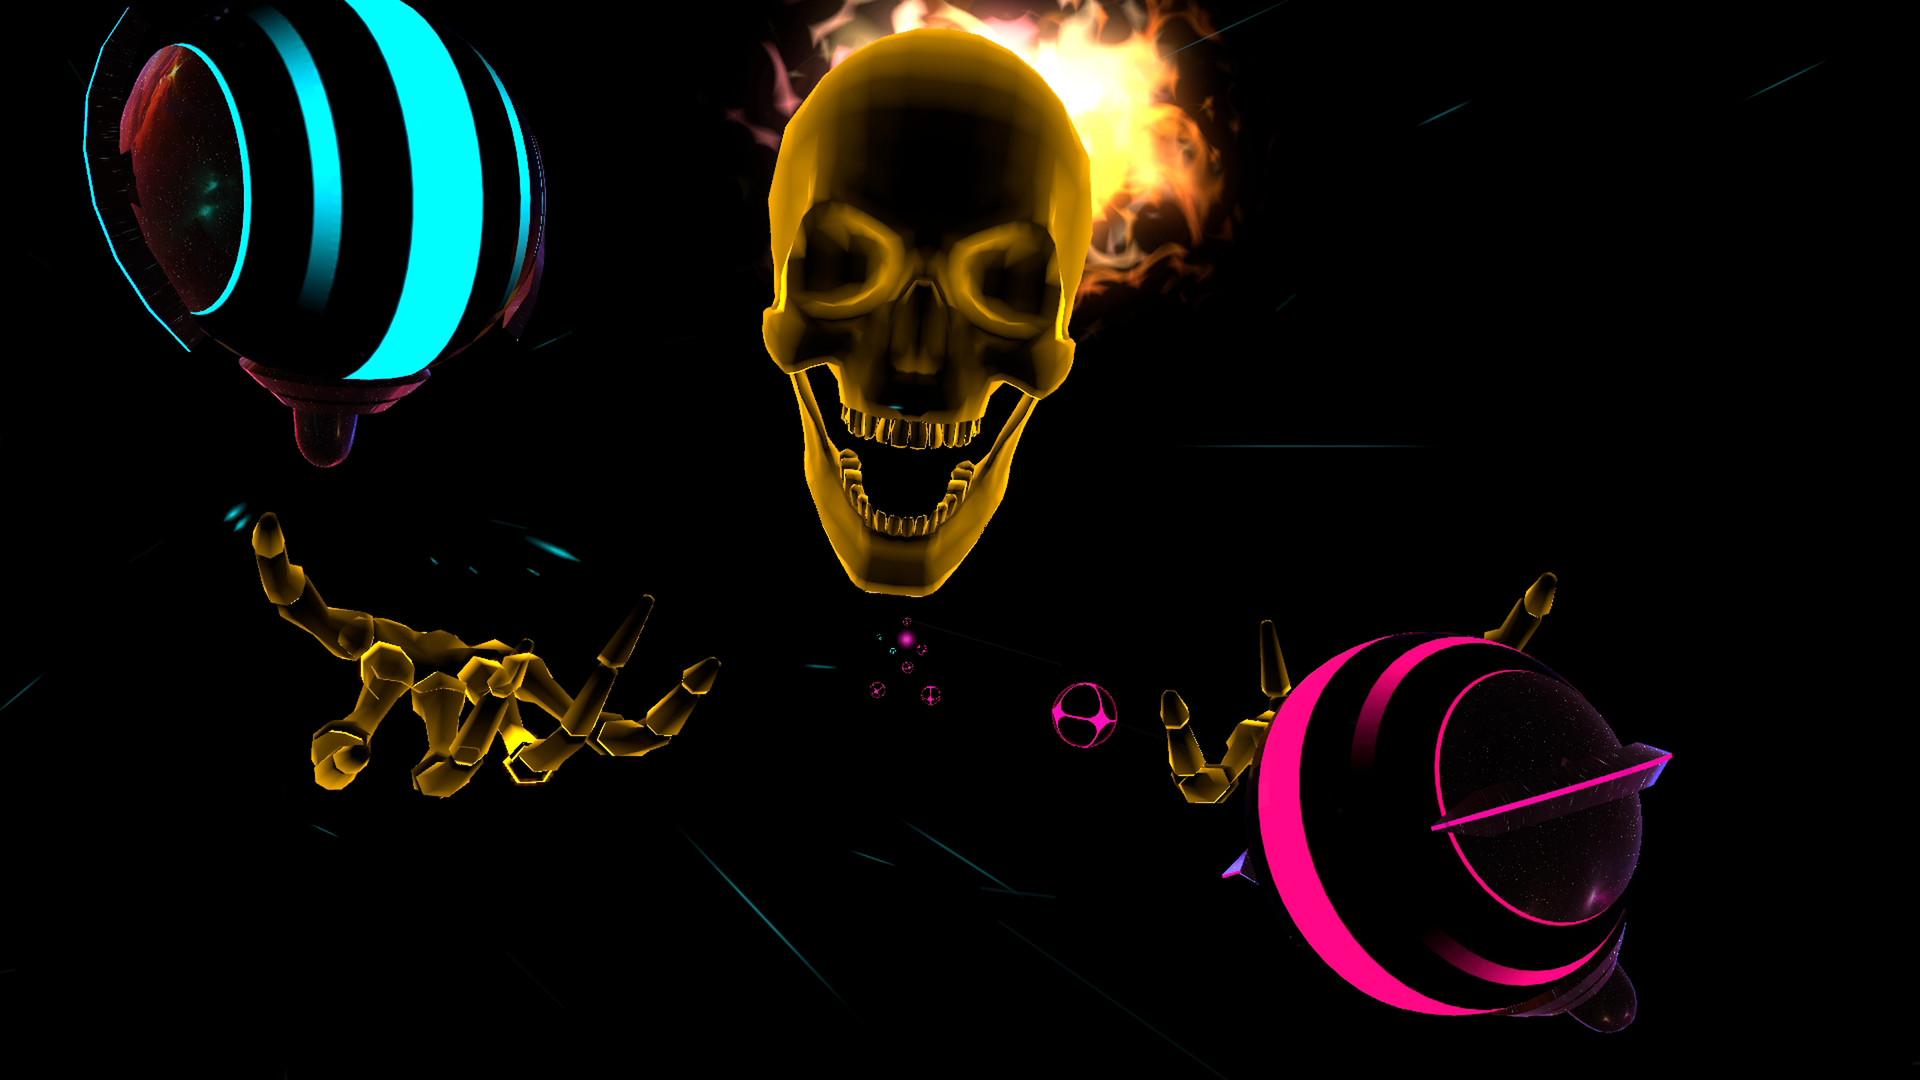 Oculus Quest 游戏《Synth Riders》合成骑士插图(2)